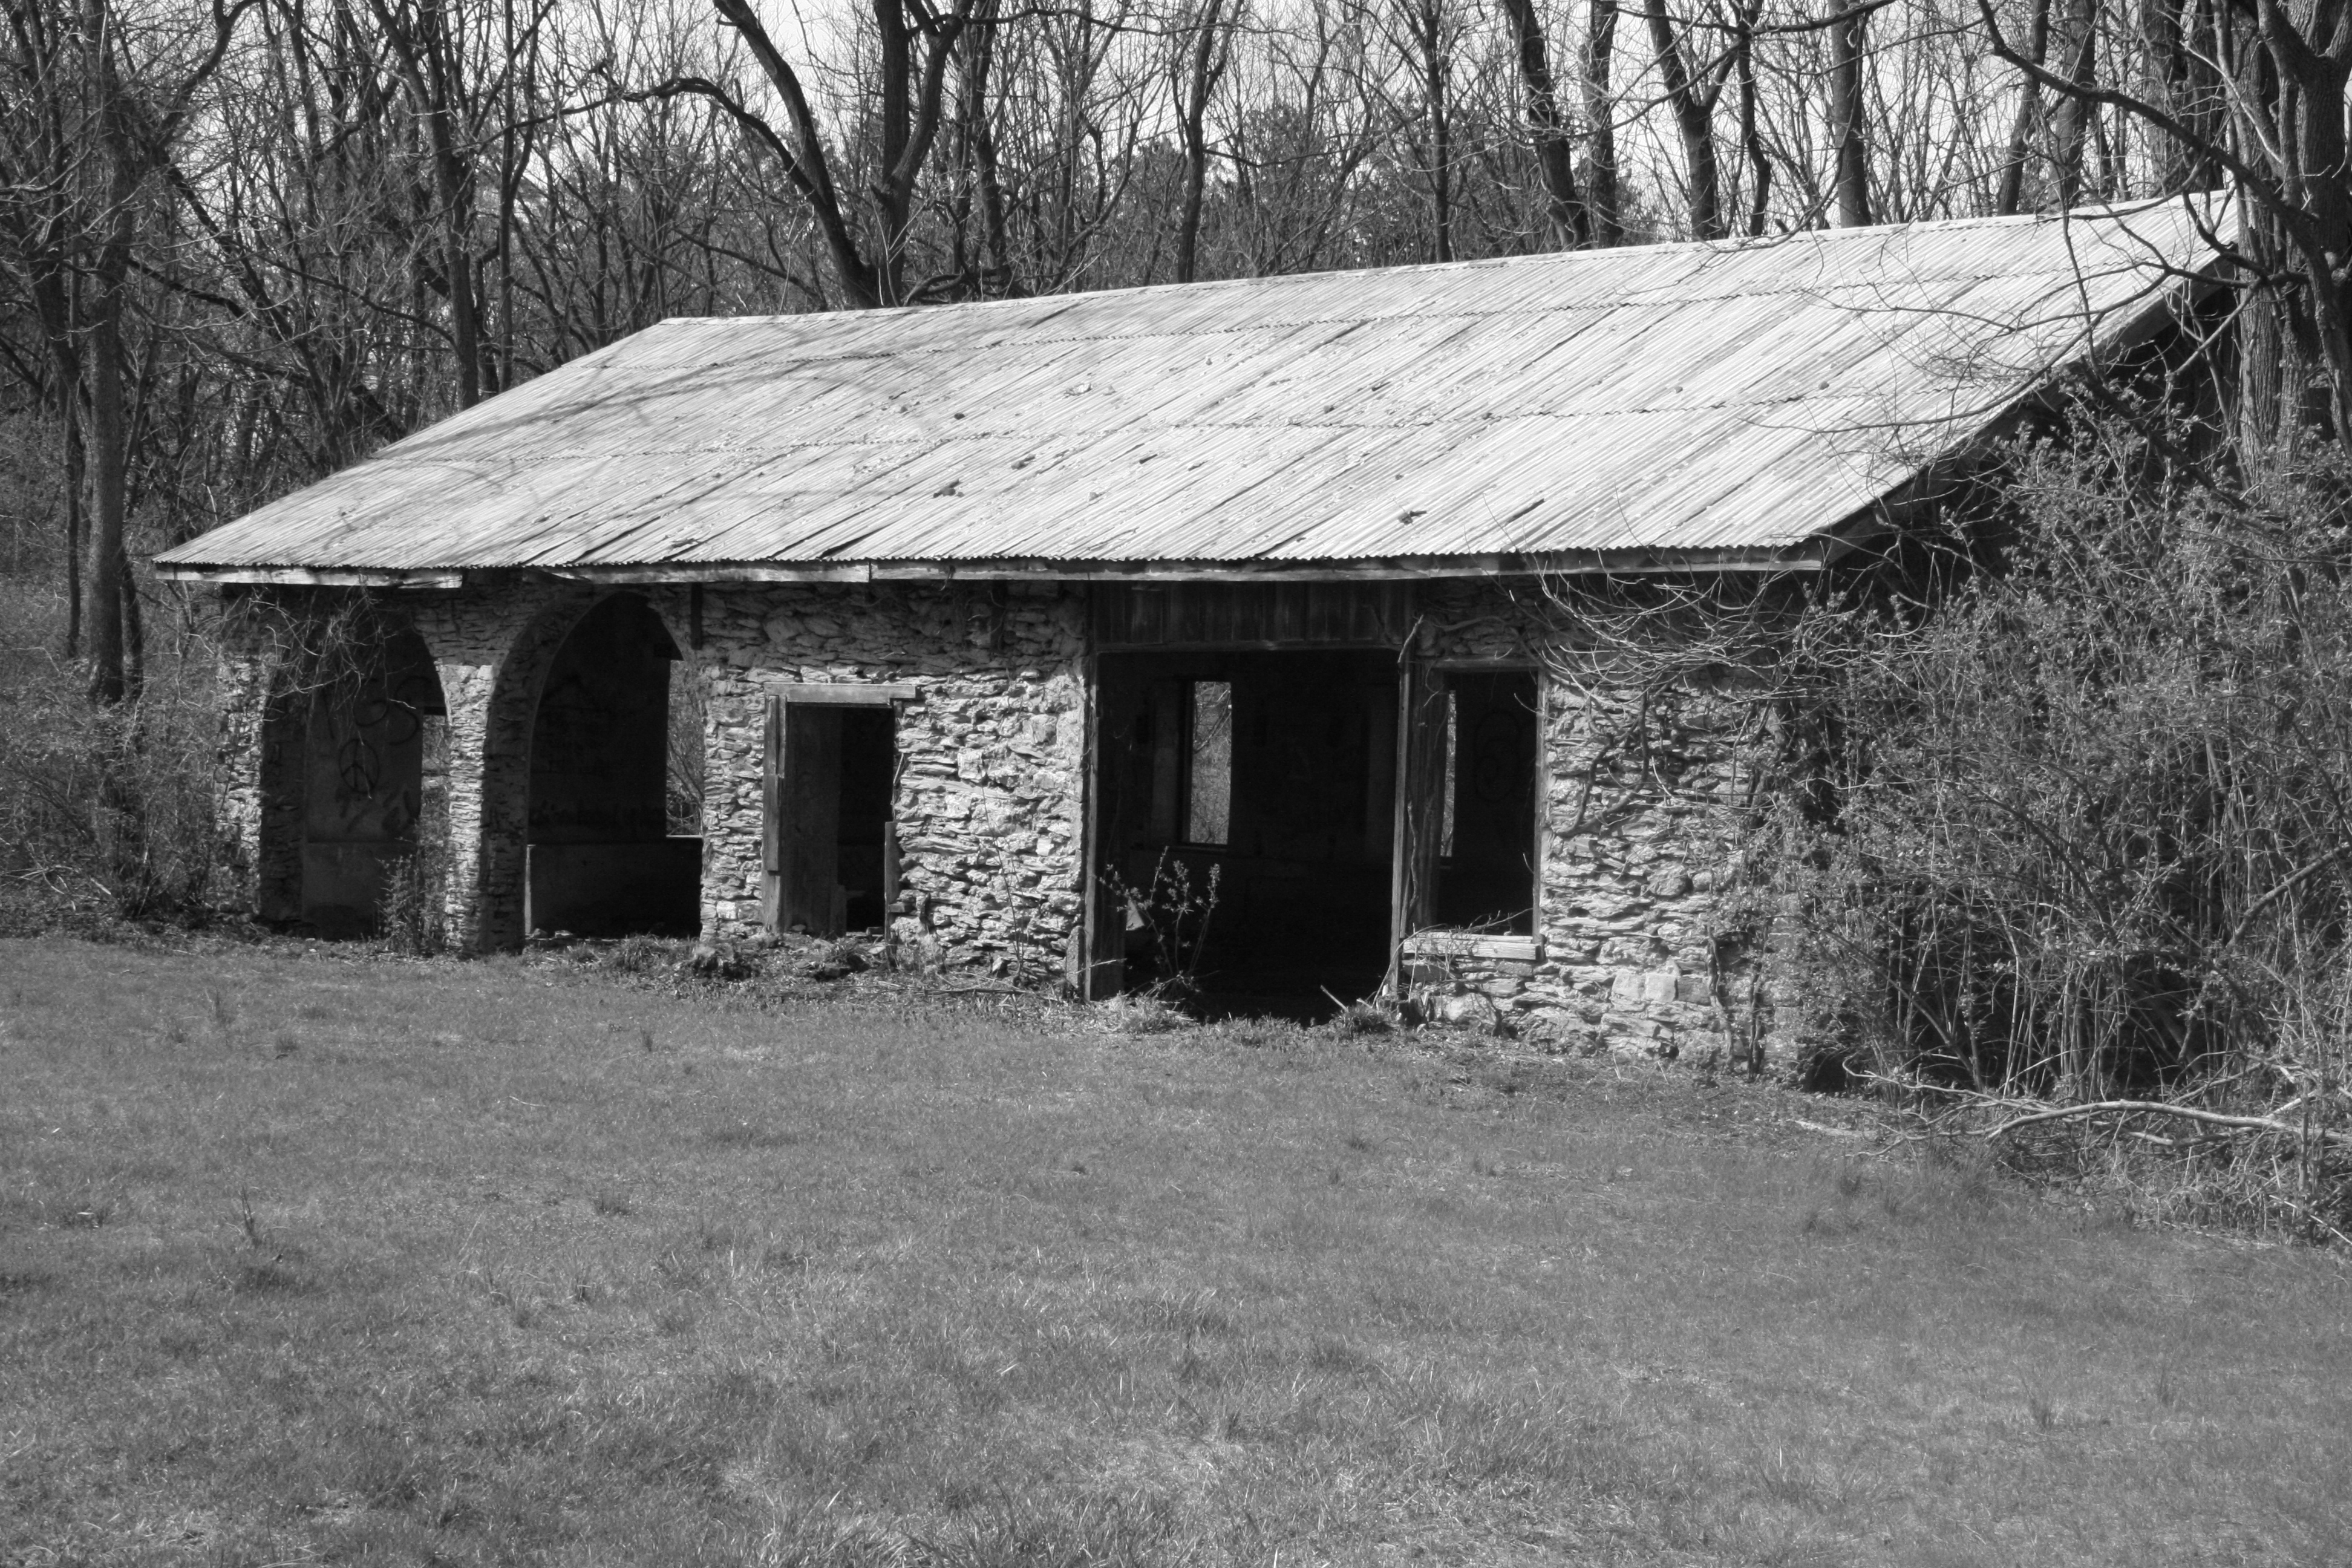 Abandoned Building, Abandoned, Black&white, Building, House, HQ Photo